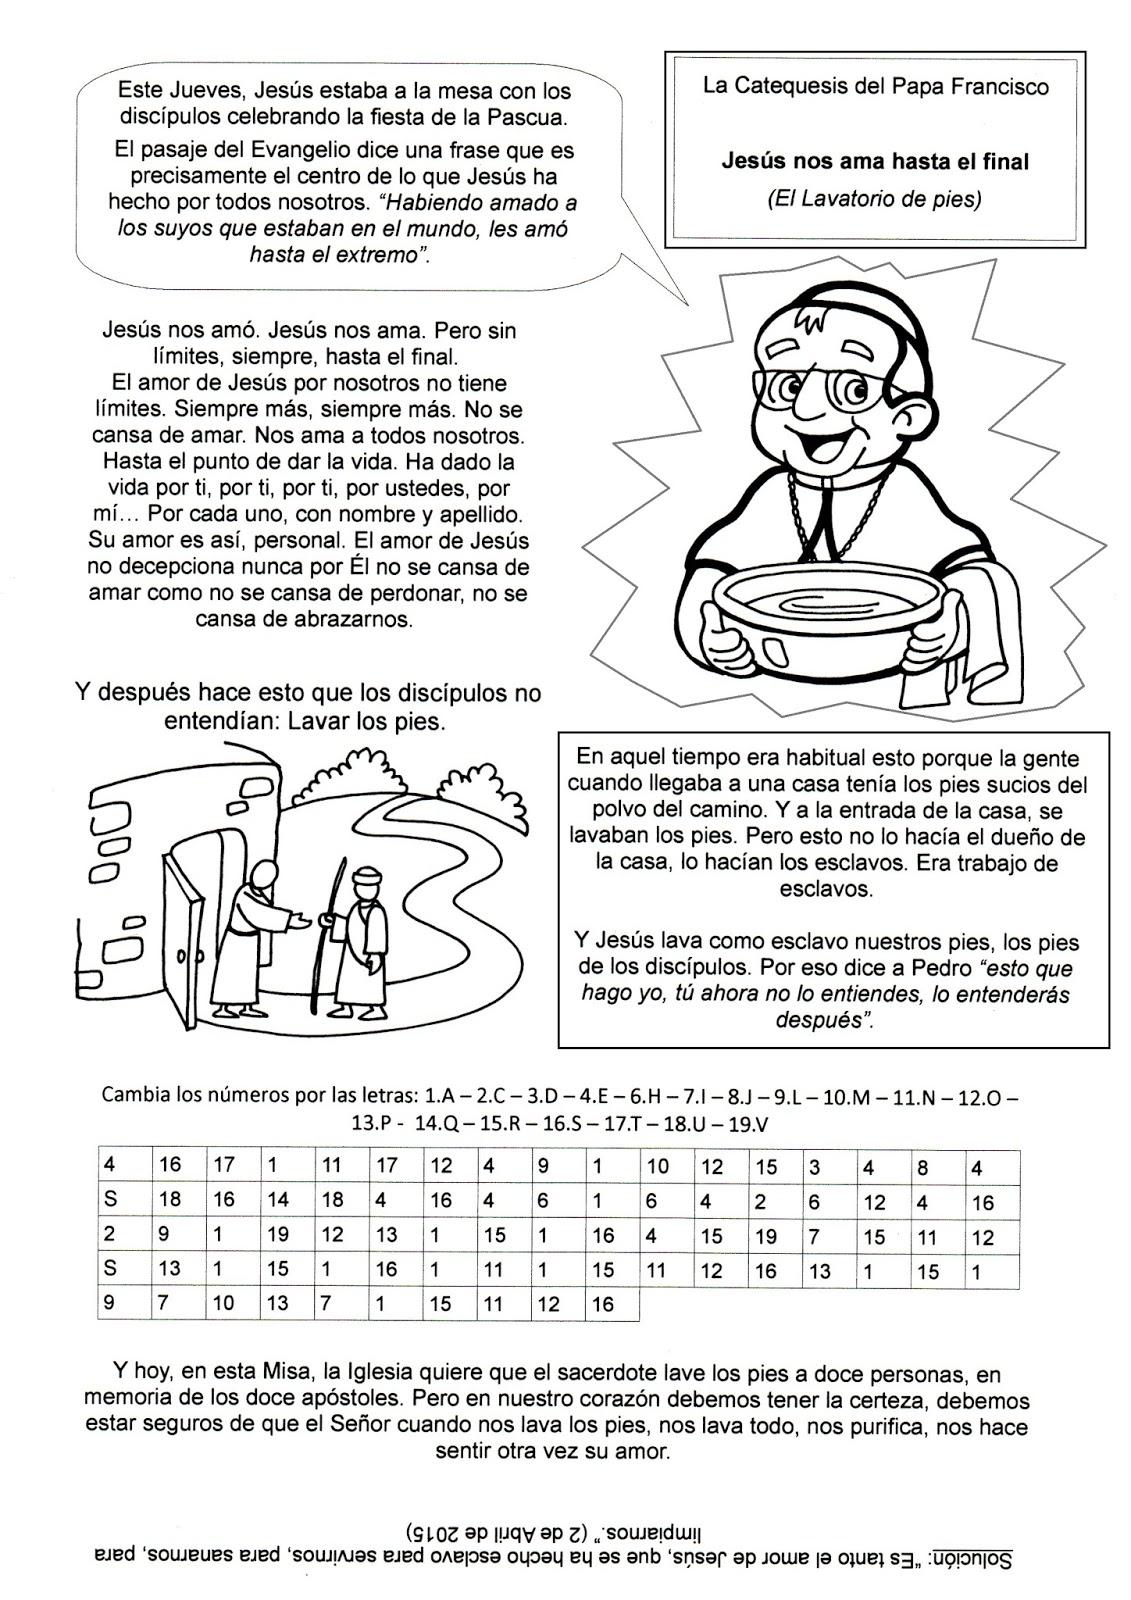 La Catequesis (El blog de Sandra): Recursos Catequesis Jueves Santo